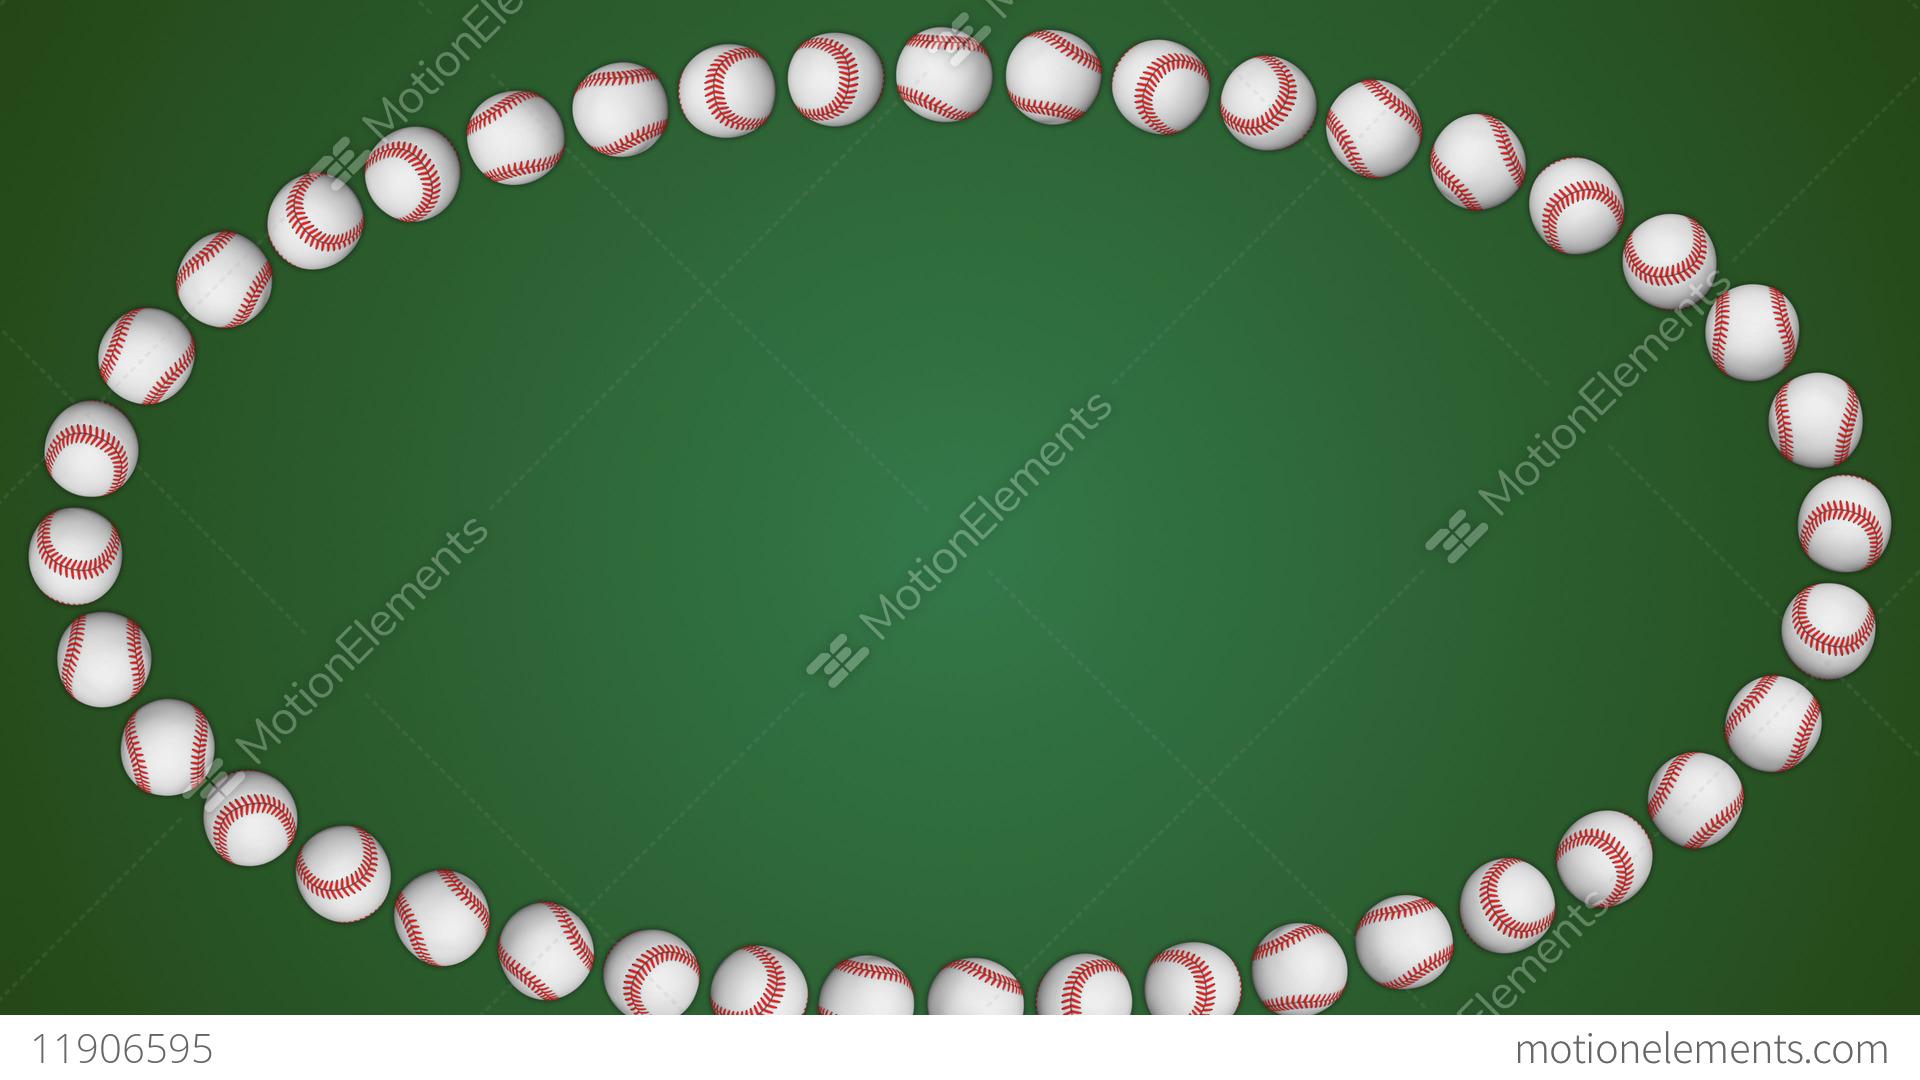 45107075daa6 Baseball ball american sport green border frame background Stock Video  Footage